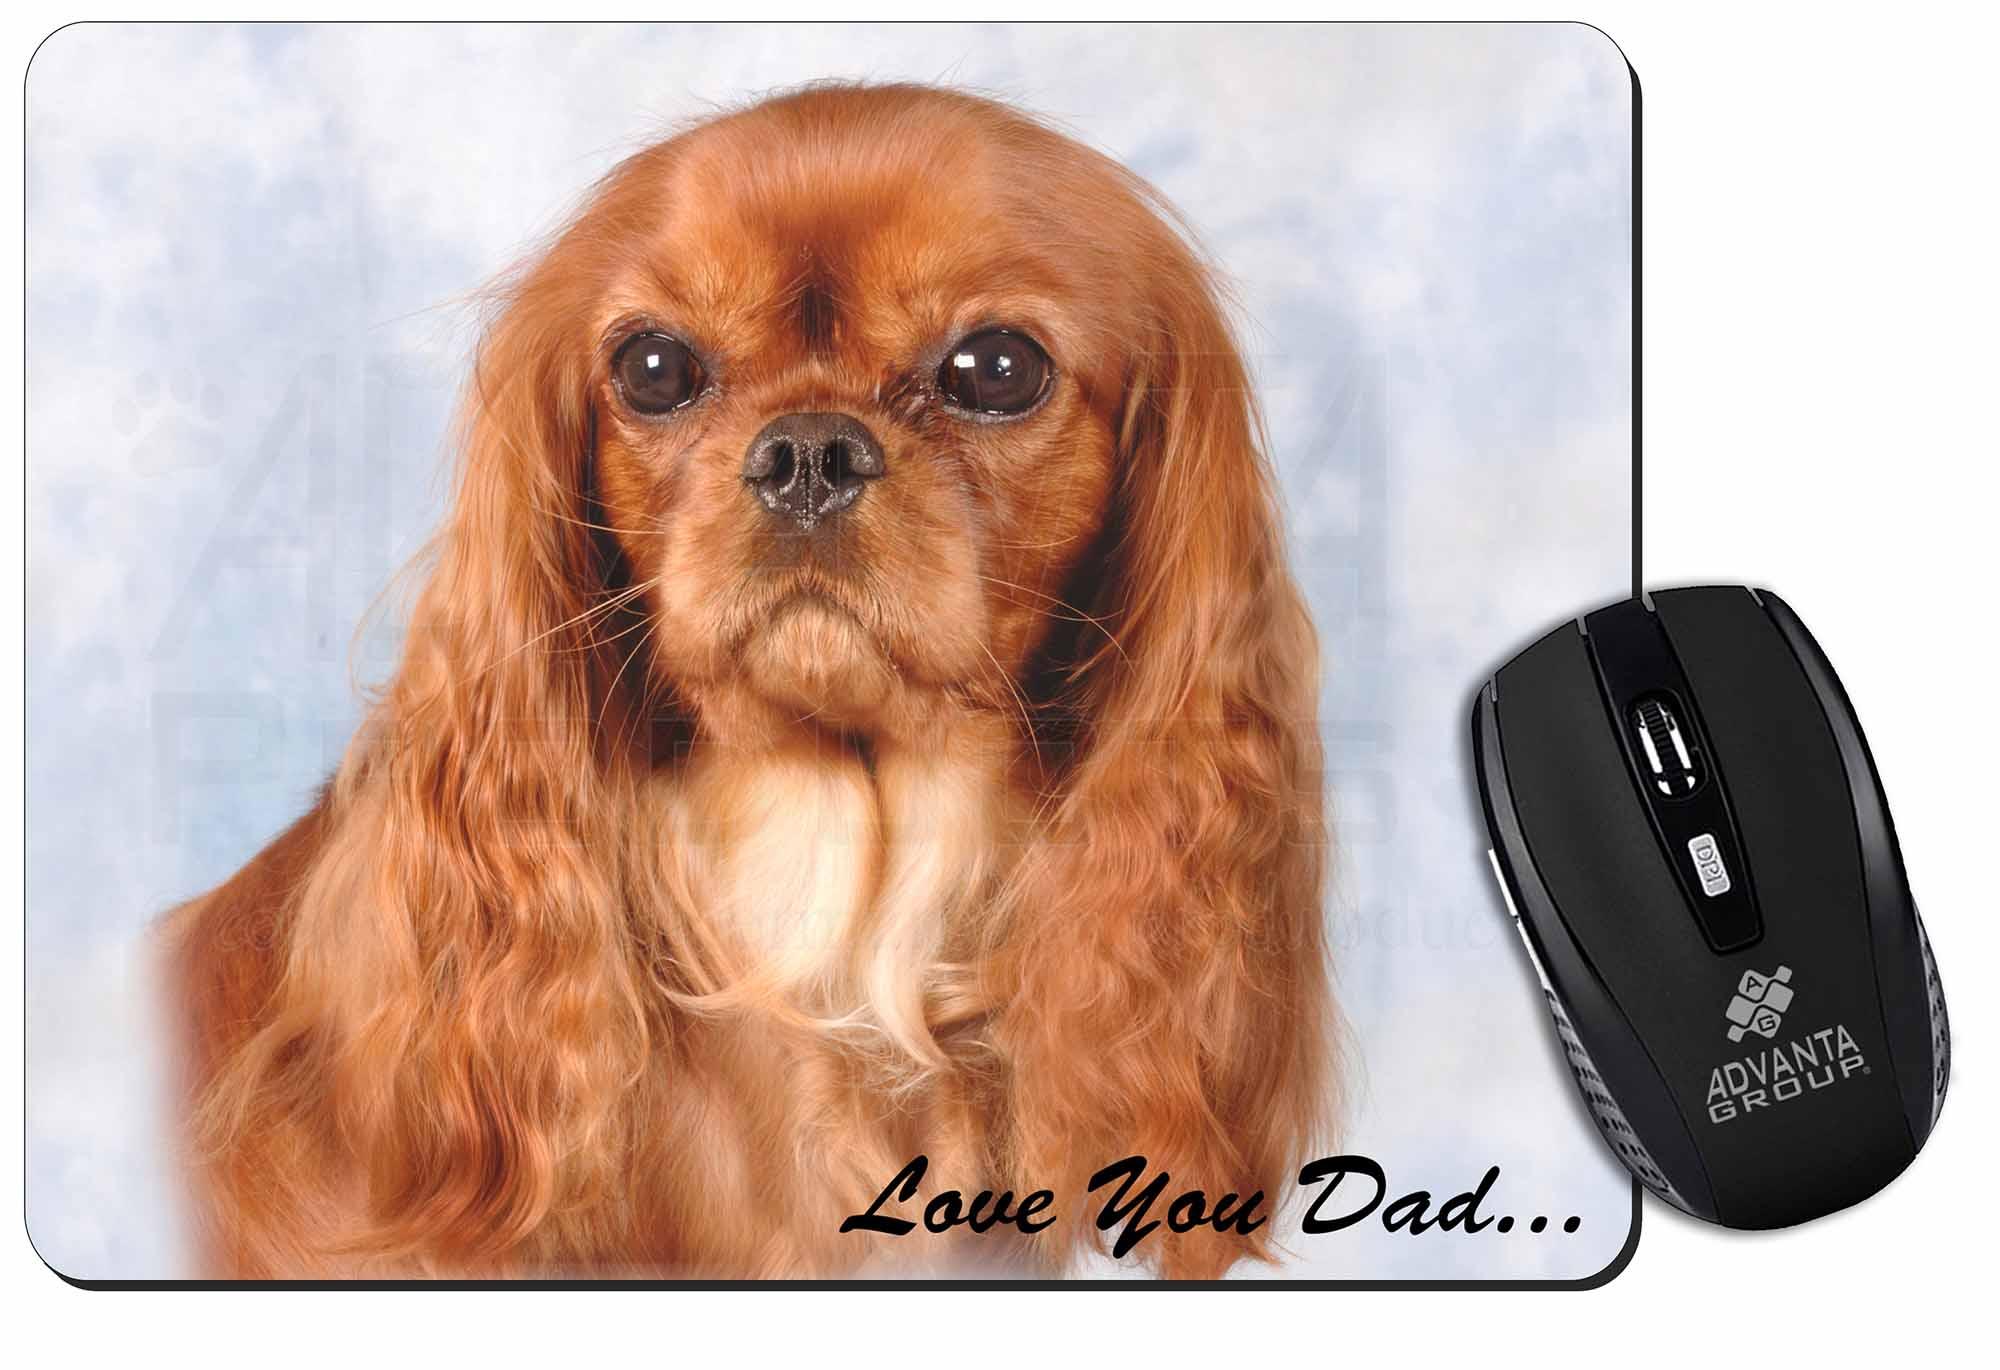 Ruby King Charles /'Love You Dad/' Black Rim Glass Placemat Animal Tabl DAD-112GP